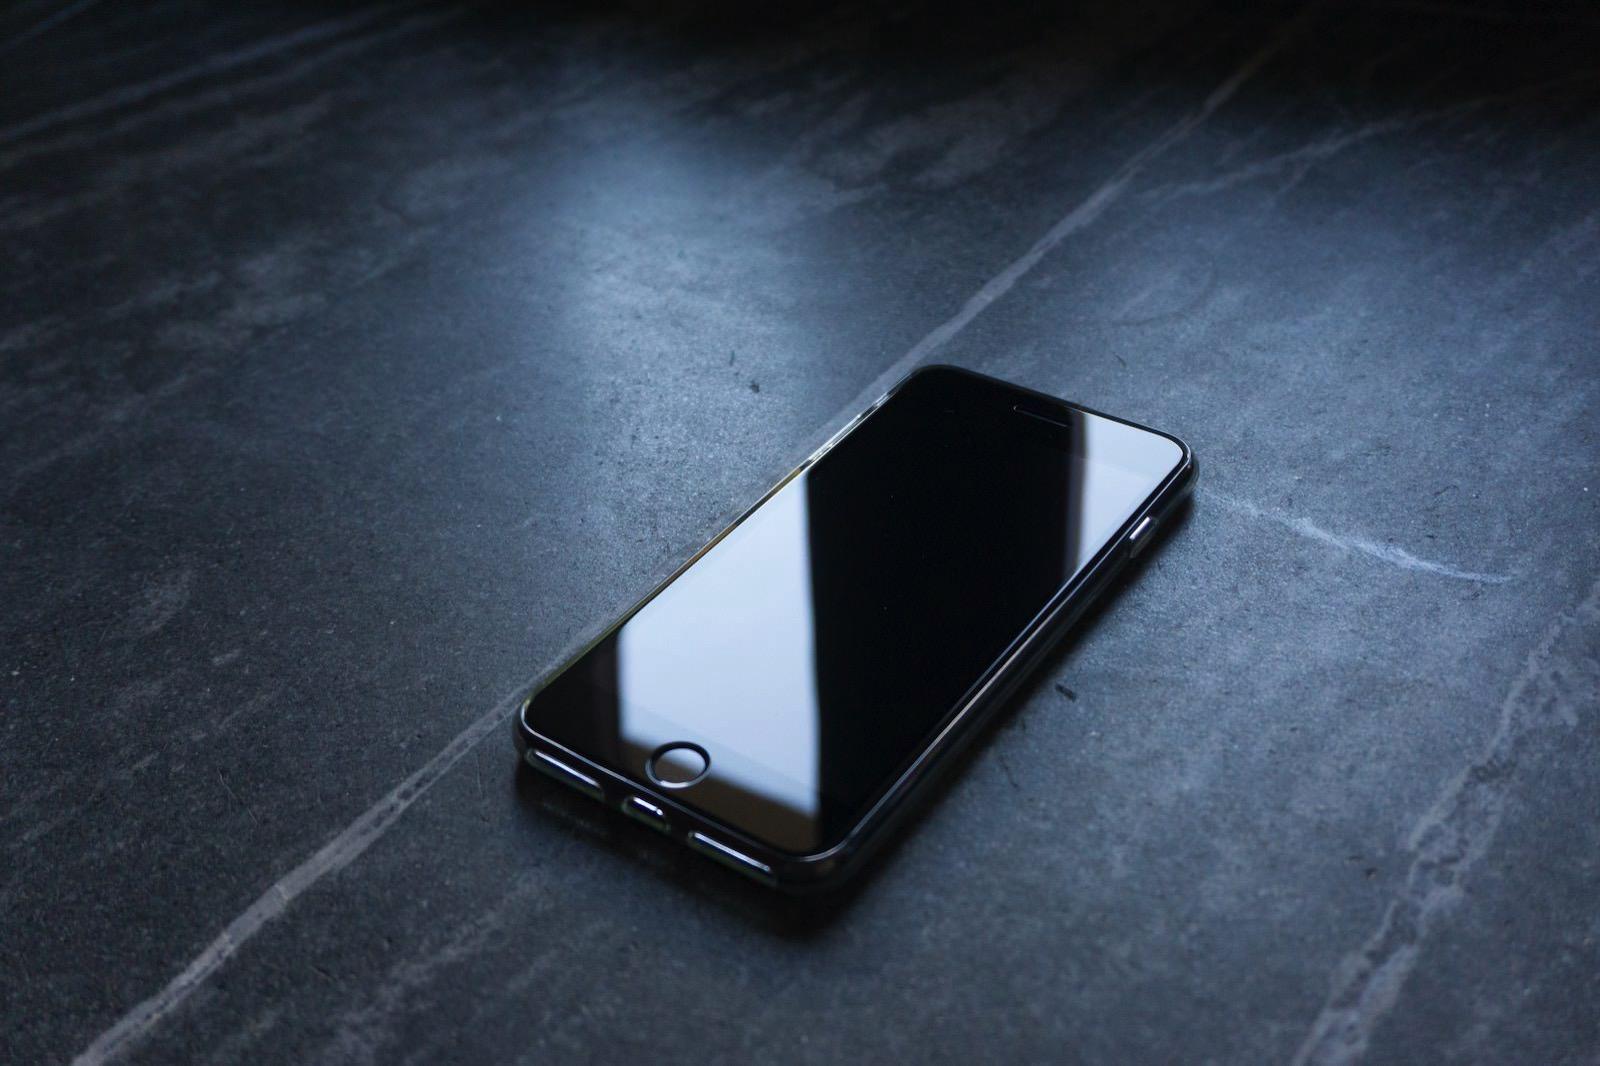 Matteo fusco 1giBTF3G4EE unsplash iphone7